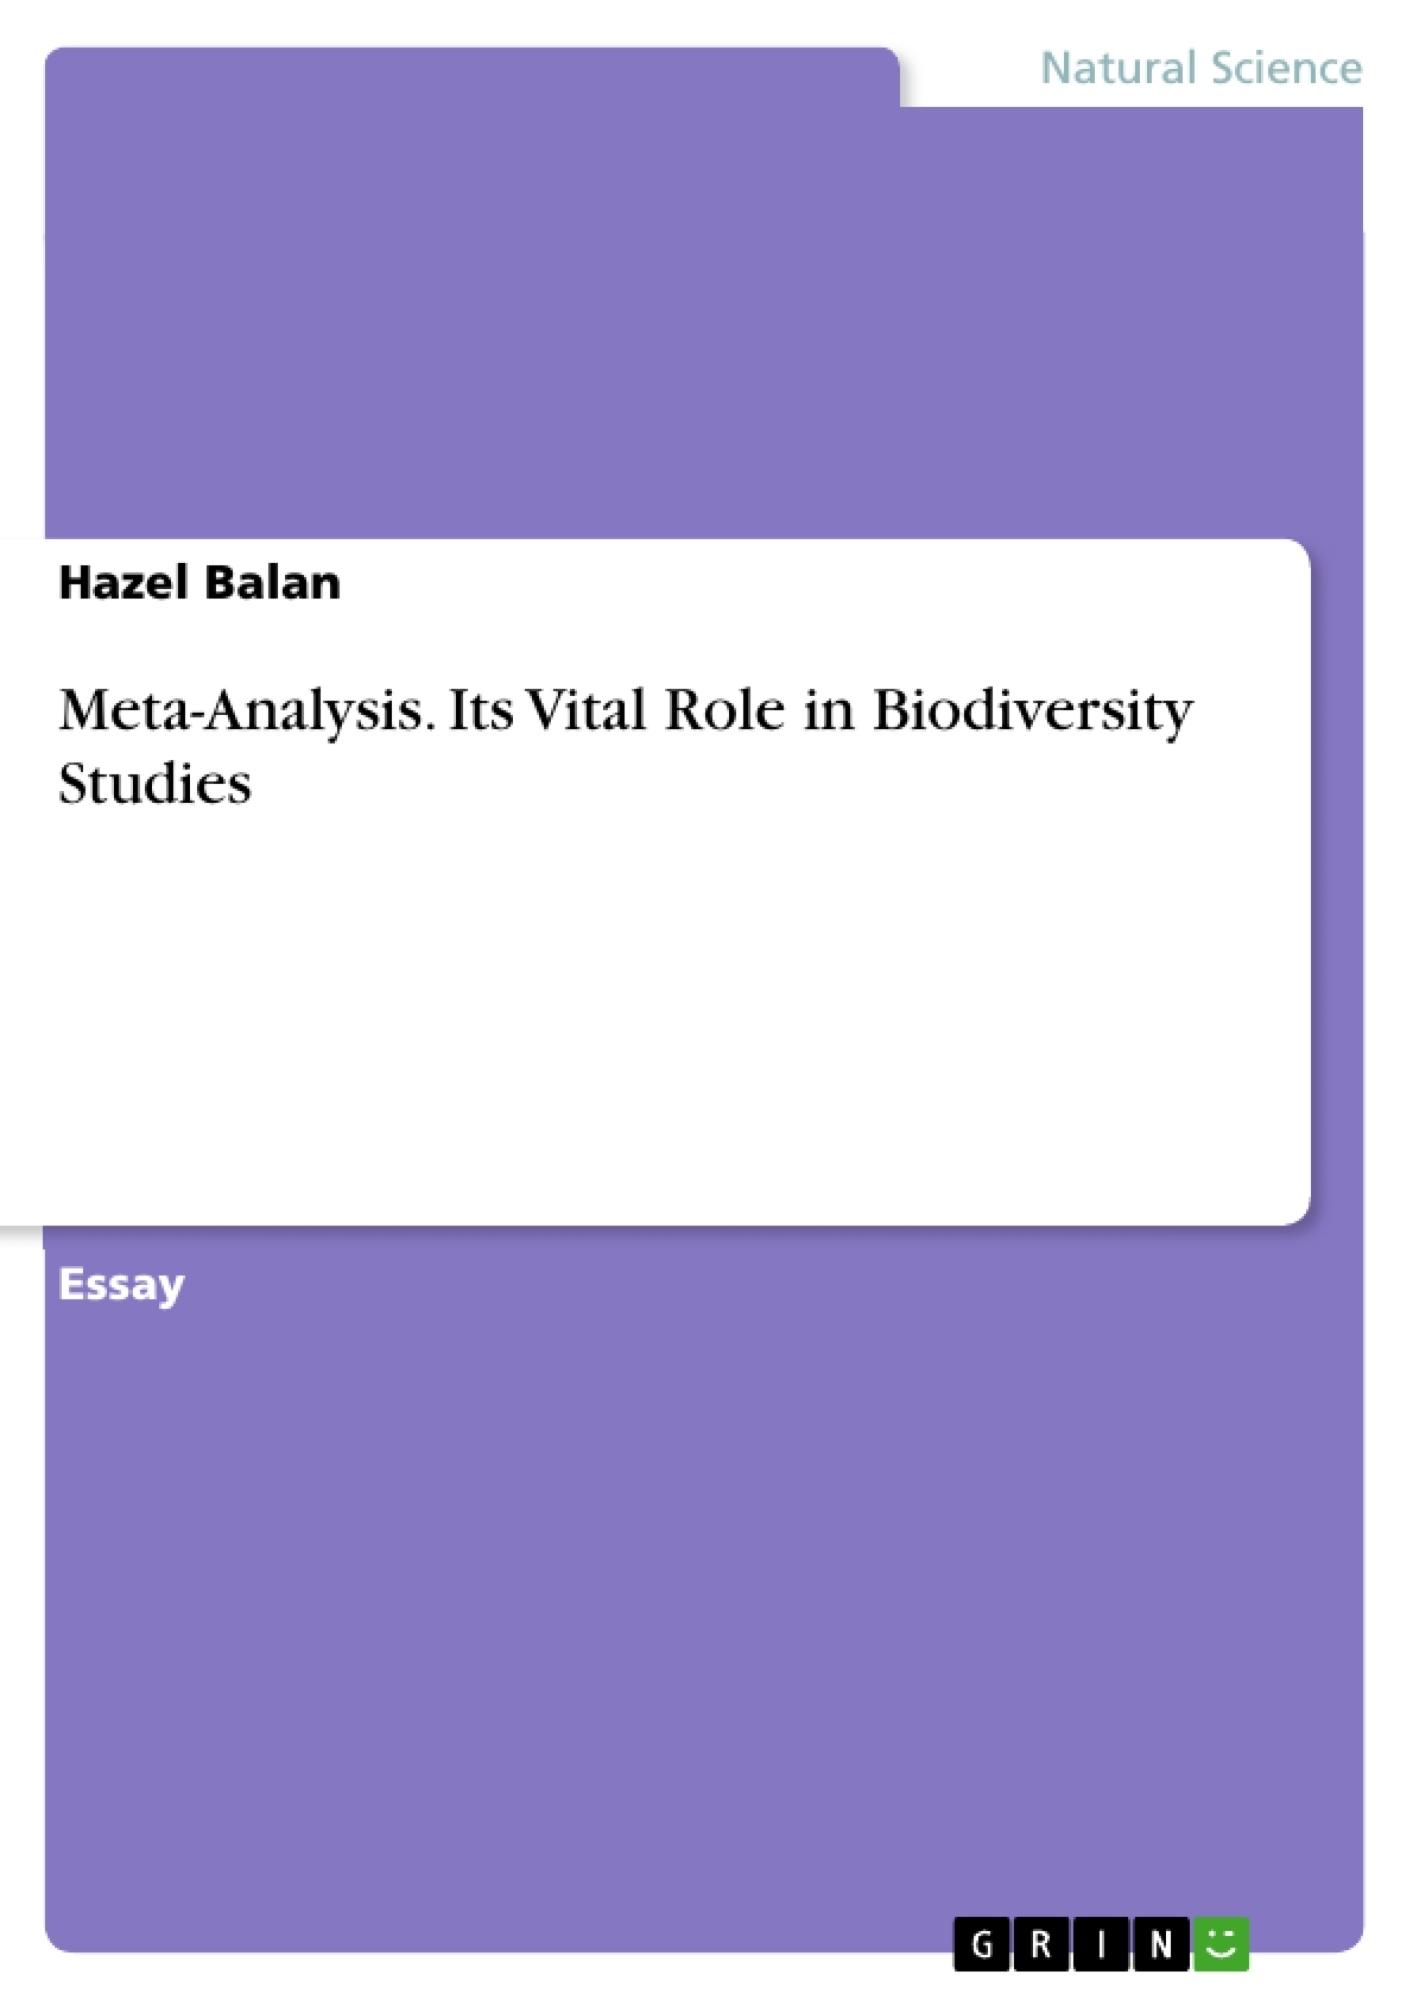 Title: Meta-Analysis. Its Vital Role in Biodiversity Studies